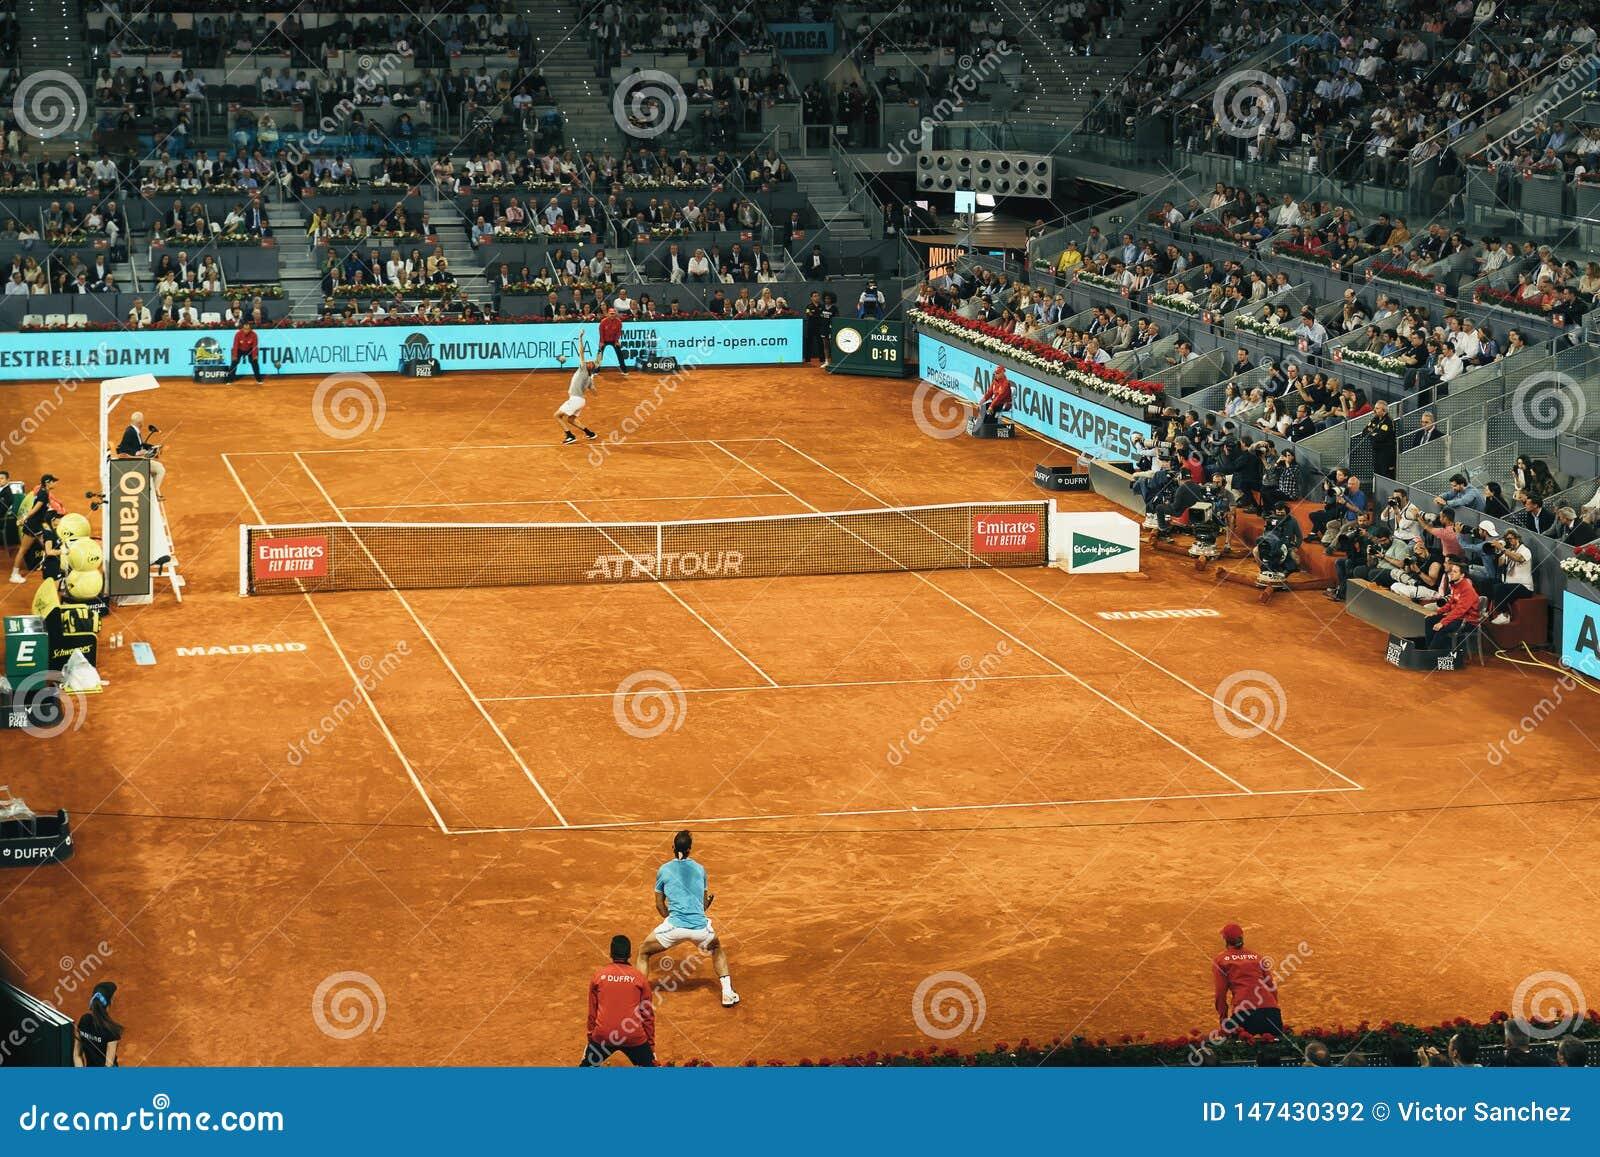 Madrid, Spain; 11 may 2019: The Caja Magica tennis center during the 2019 Mutua Madrid Open ATP Premier Mandatory tennis